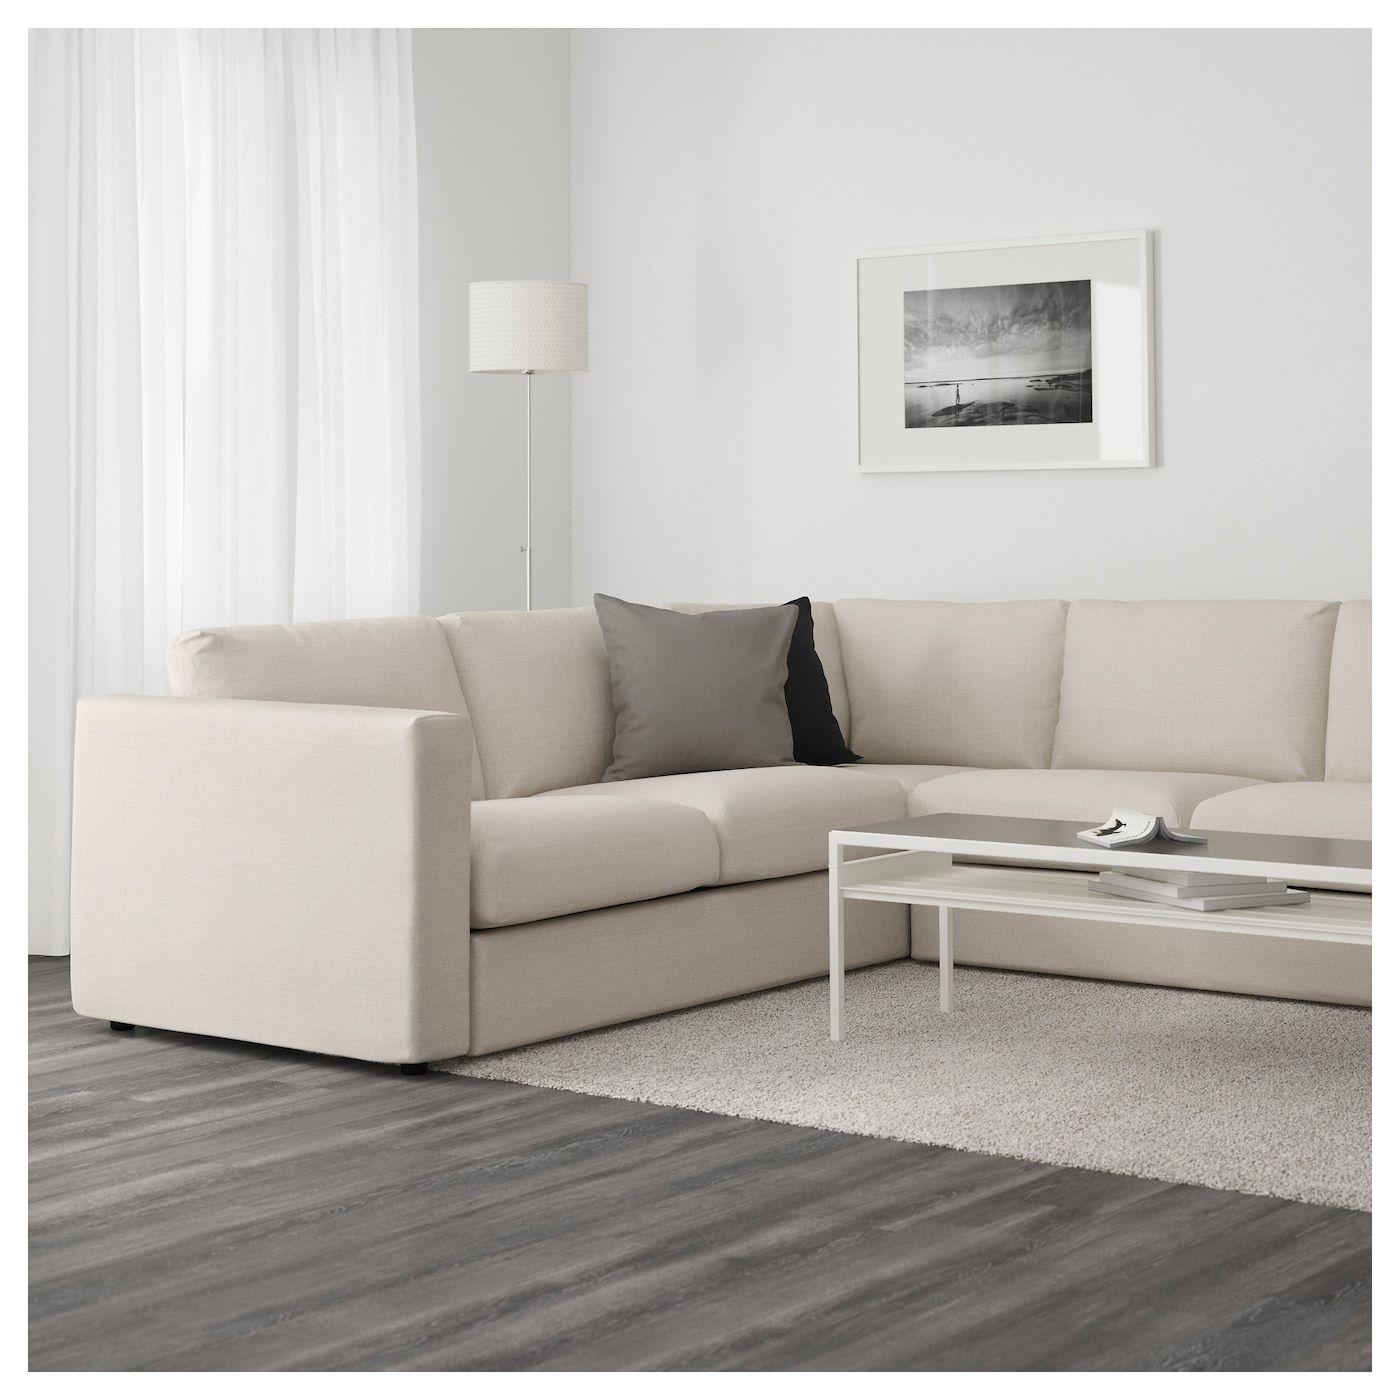 IKEA VIMLE Sectional, 5seat corner Gunnared beige